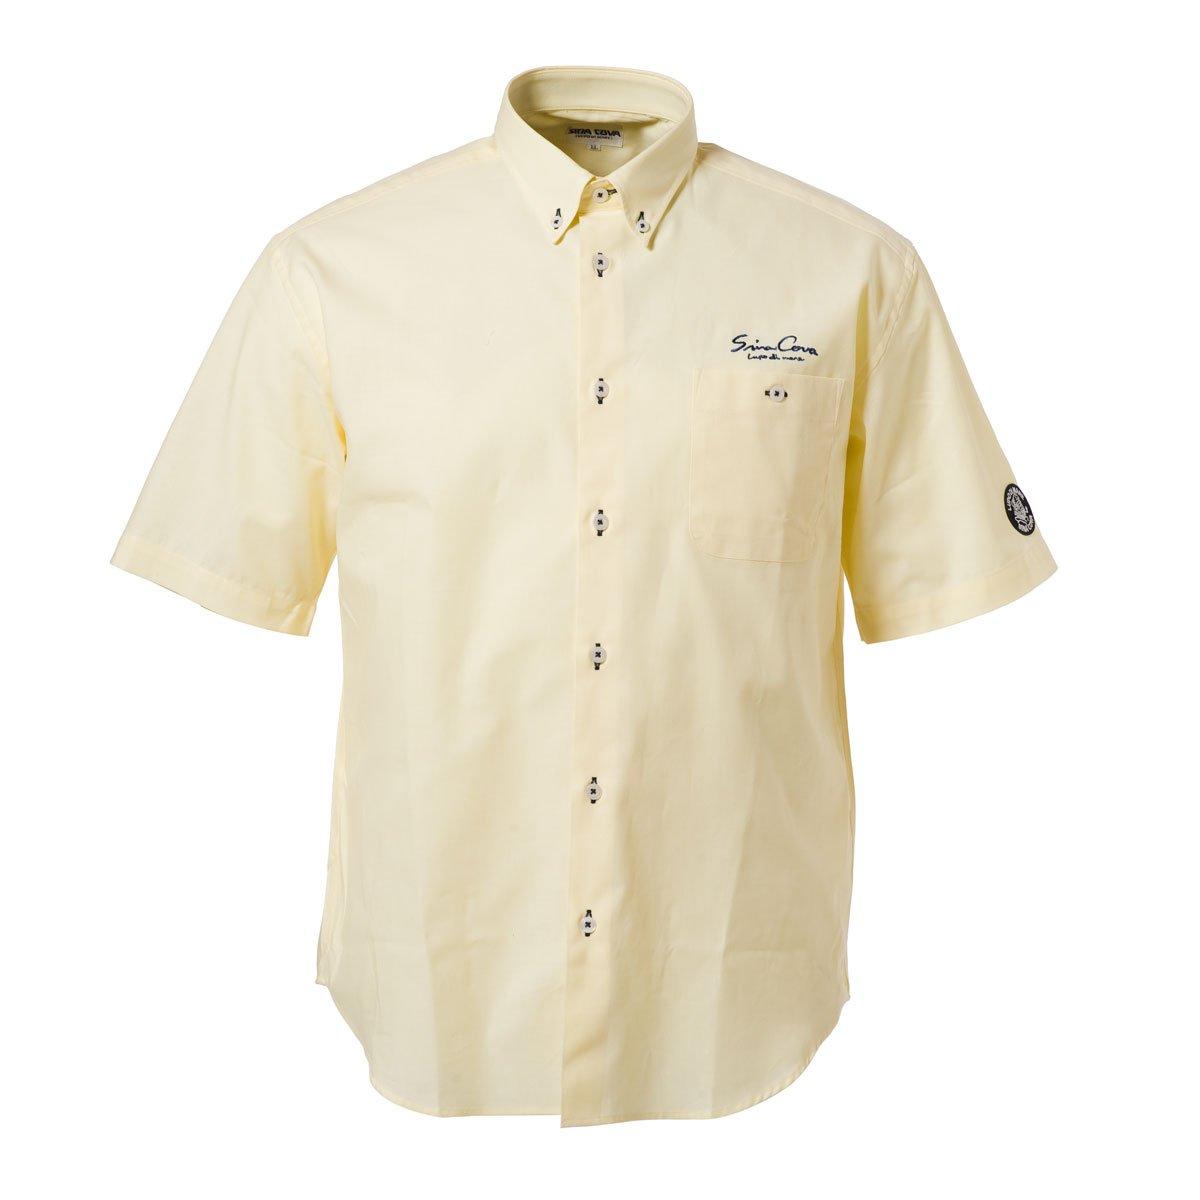 Cova SINACOVA 18124510 Men's Short Sleeve Shirt Yellow Medium by Cova (Image #1)